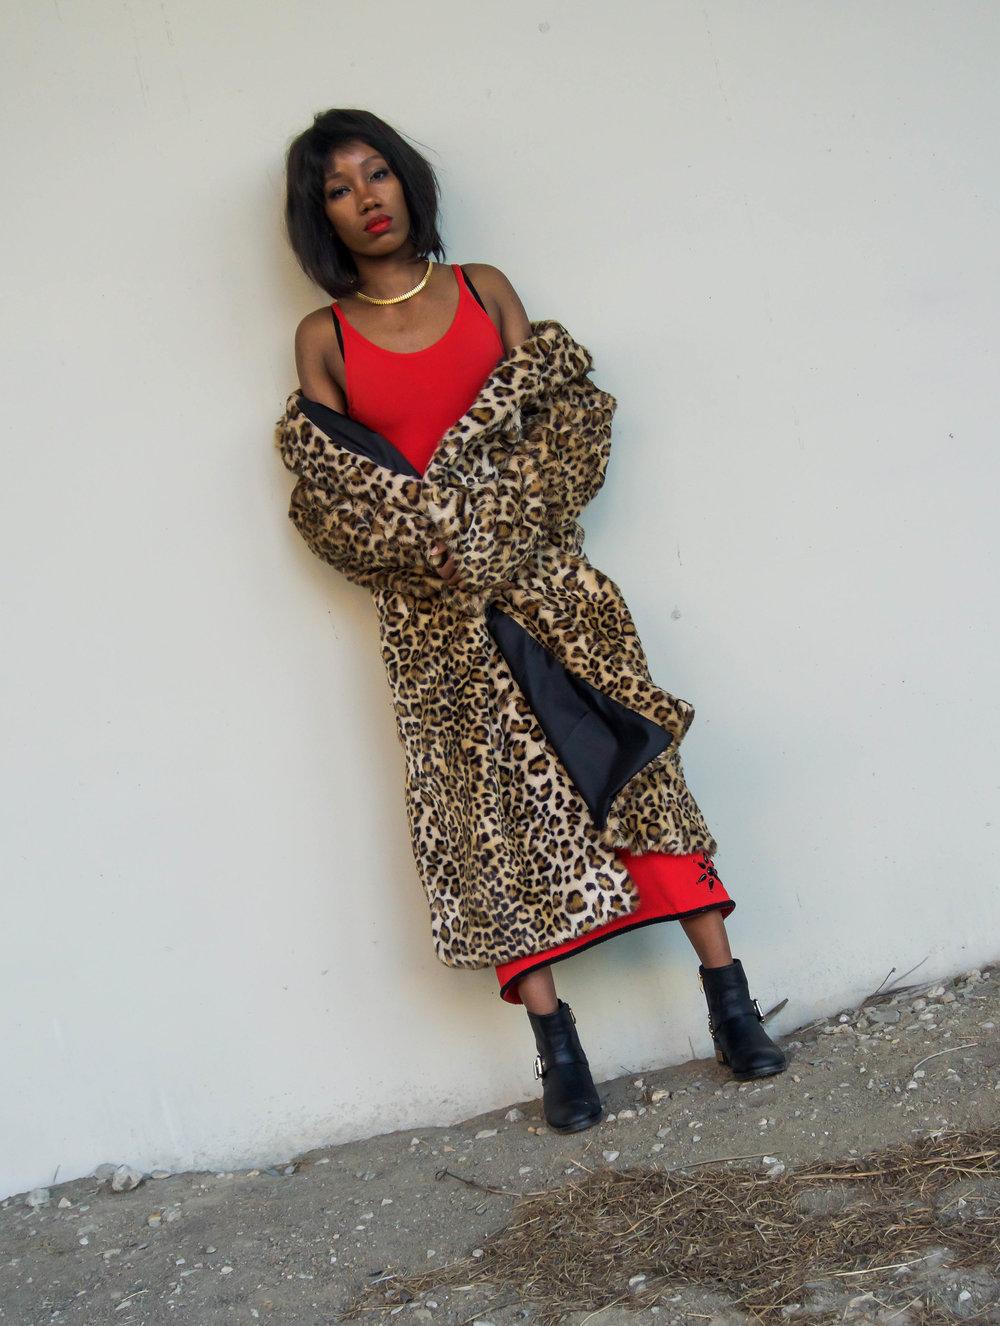 ASOS Red BodyCon Dress - Leopard Fur Coat